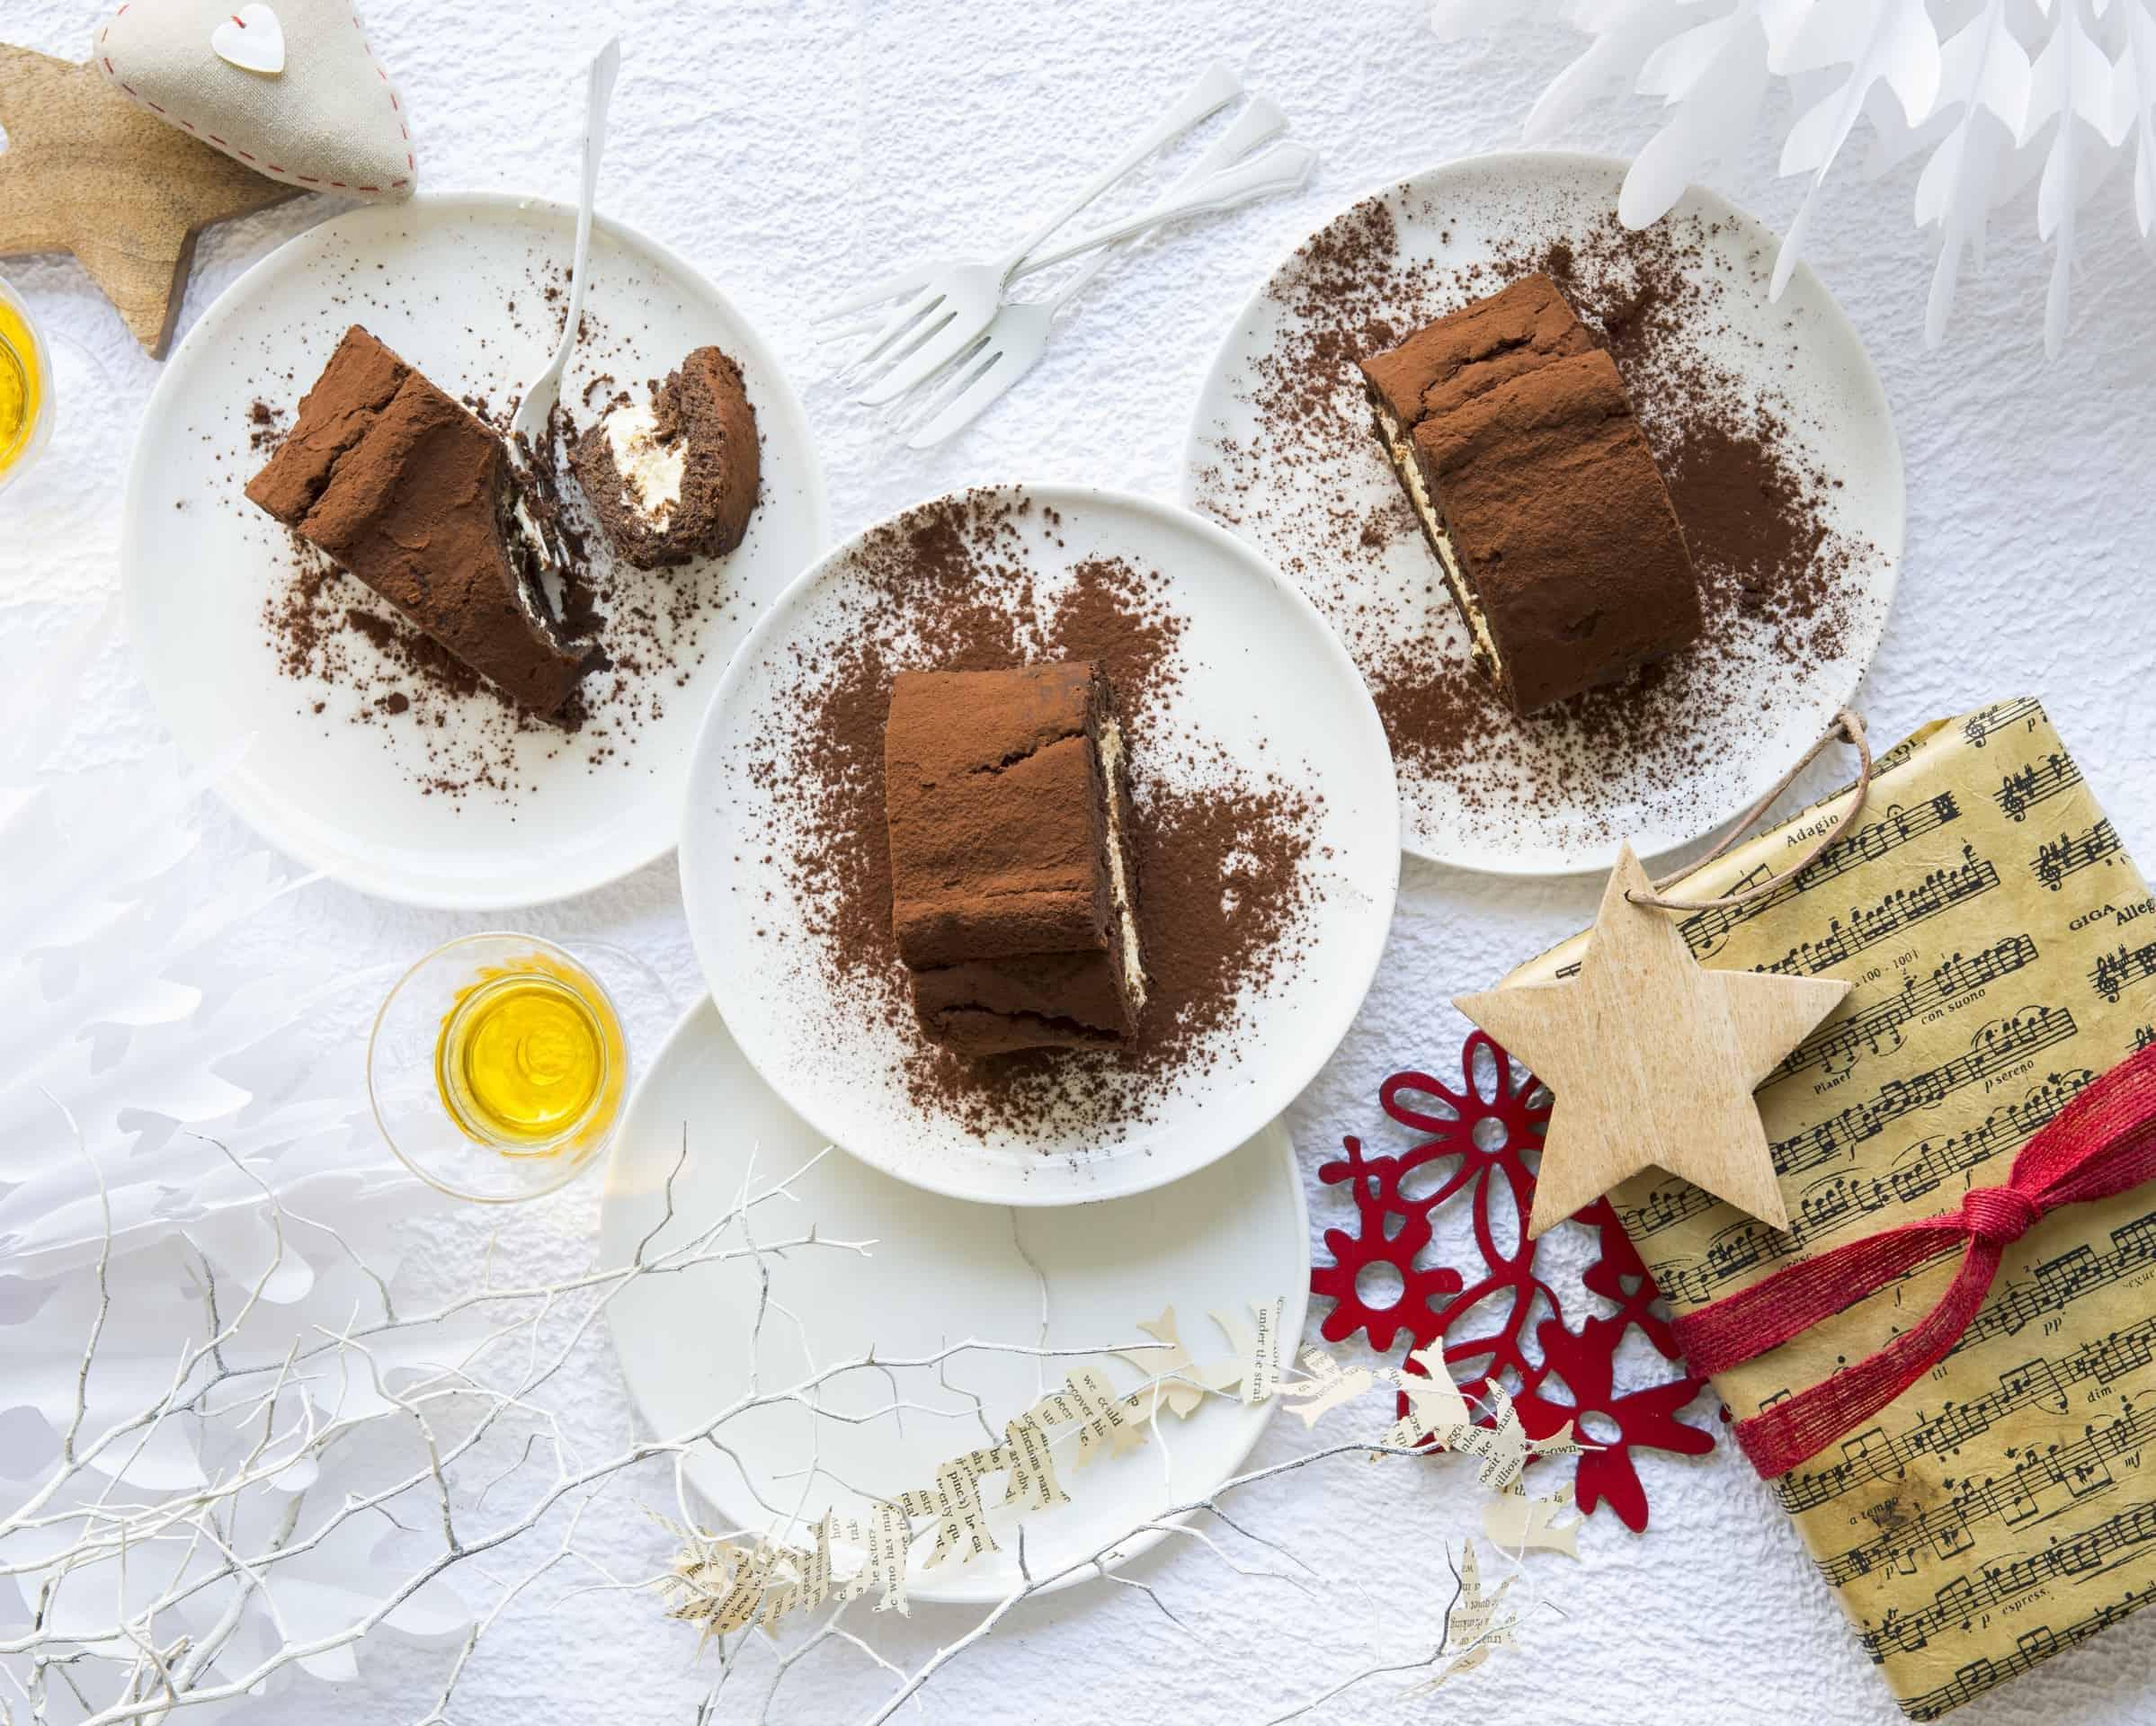 Buche de noel #4 praline caramel et speculoos